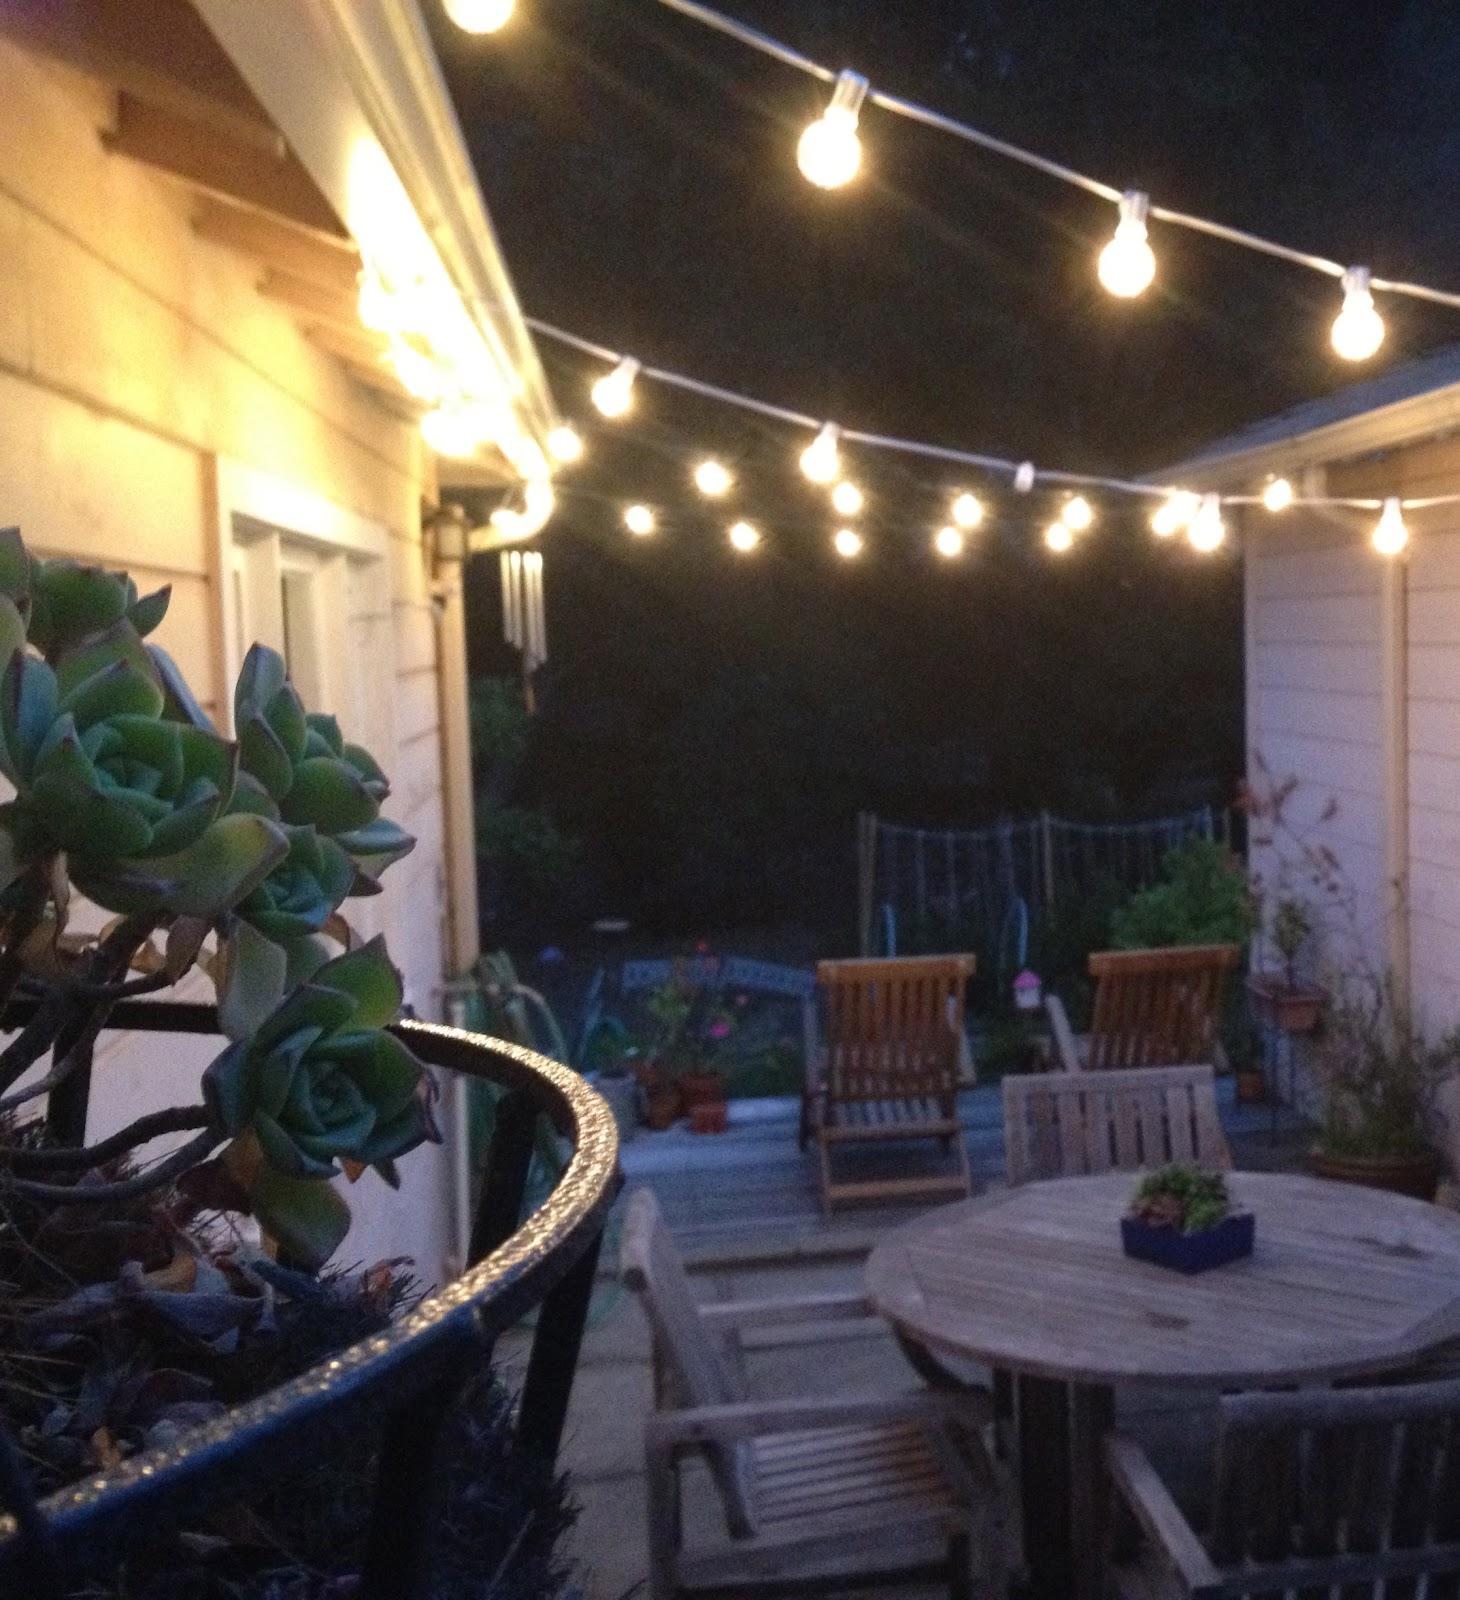 The Best Exterior String Lights Ideas - HomesFeed on Backyard String Light Designs id=15009